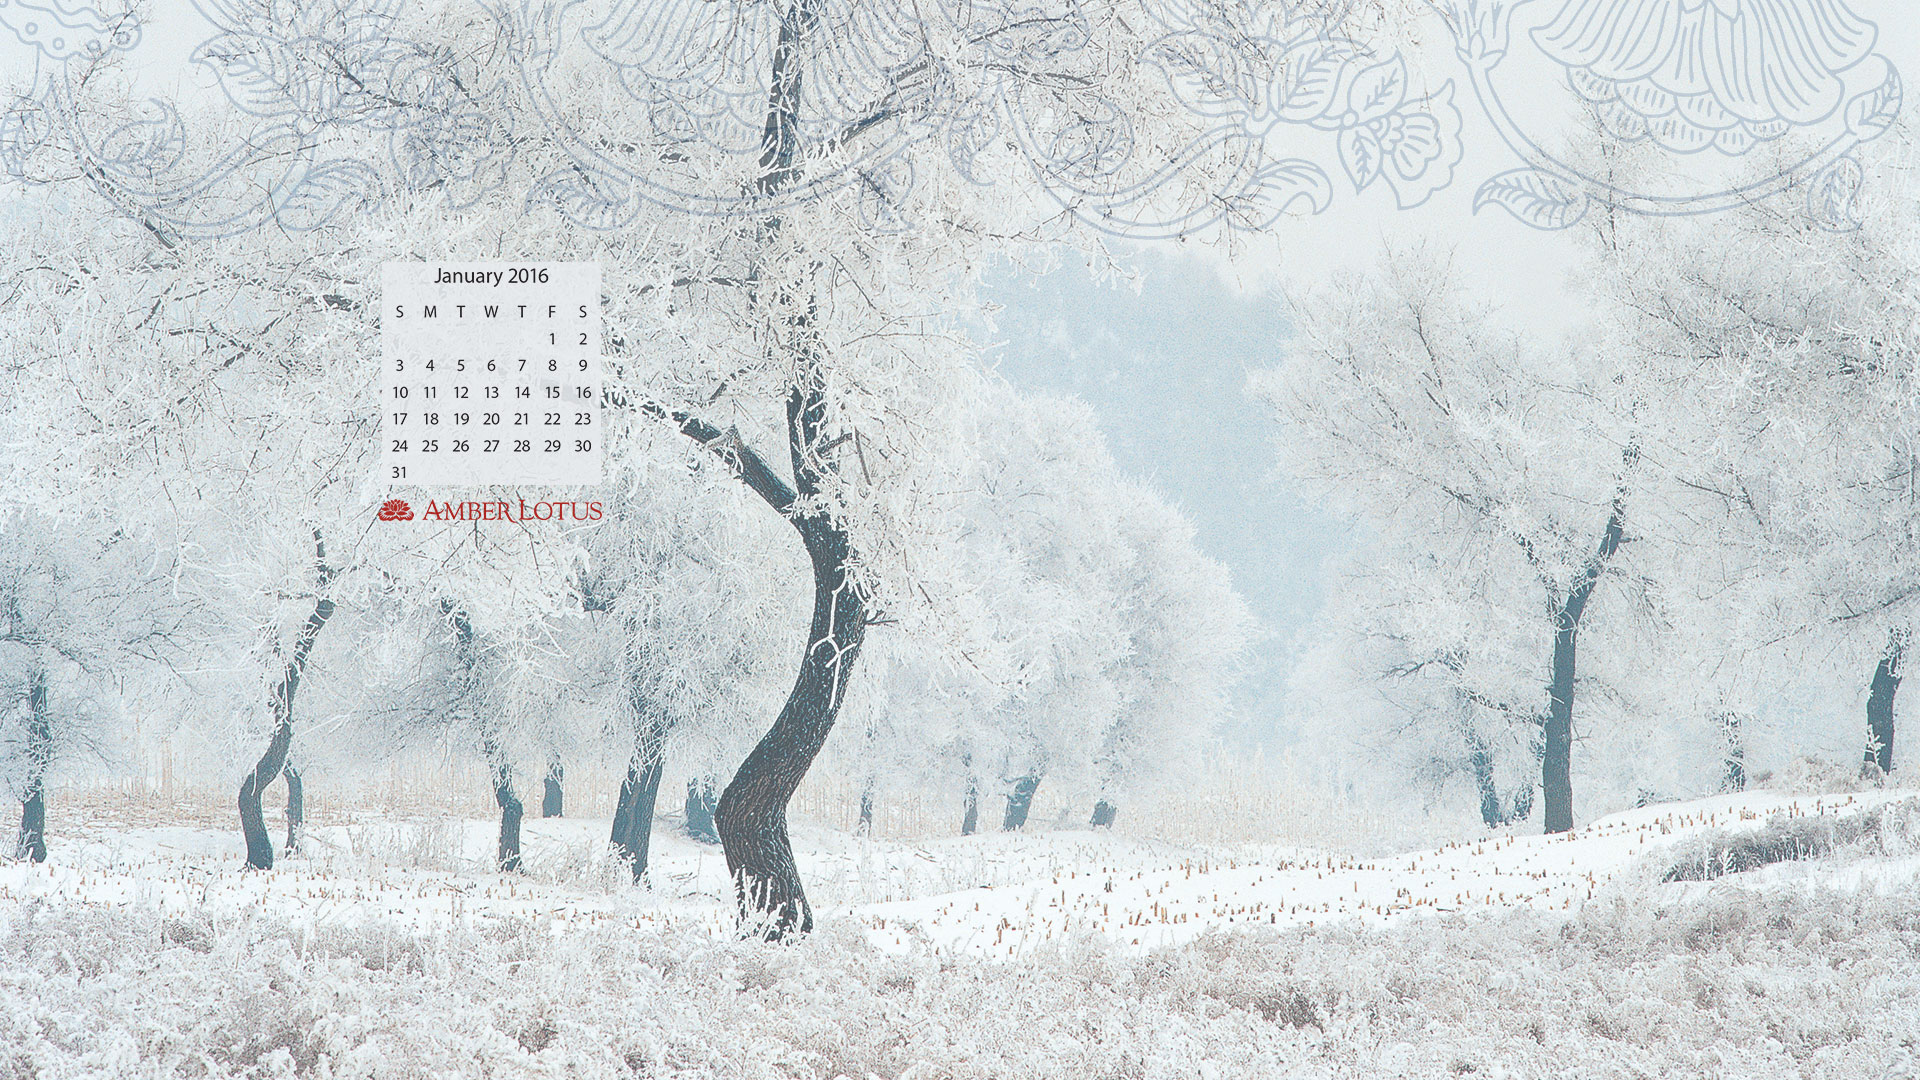 Desktop Wallpaper Calendar January 2016 to Download 1920x1080